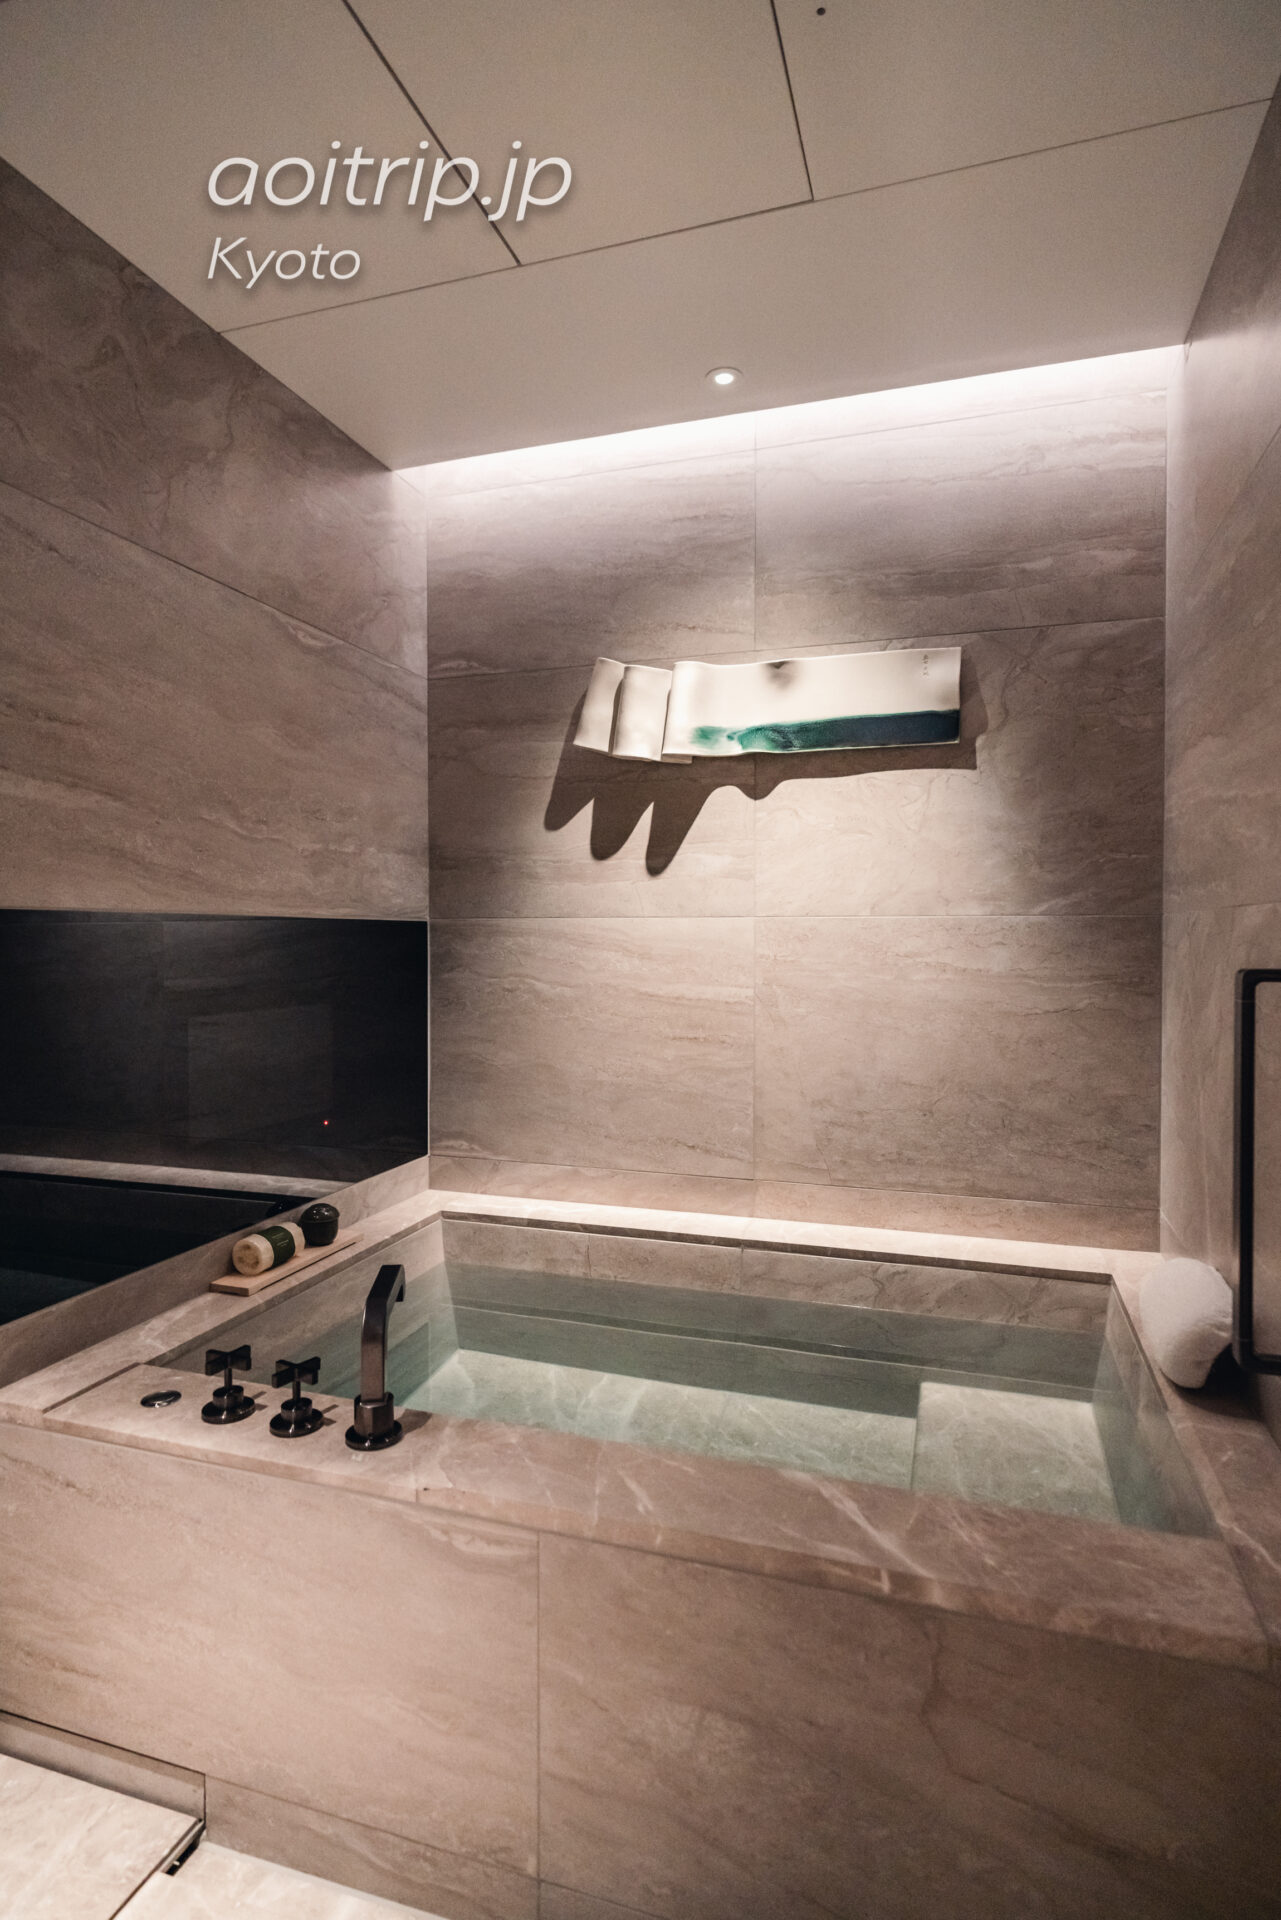 HOTEL THE MITSUI KYOTO デラックススイートのバスルーム